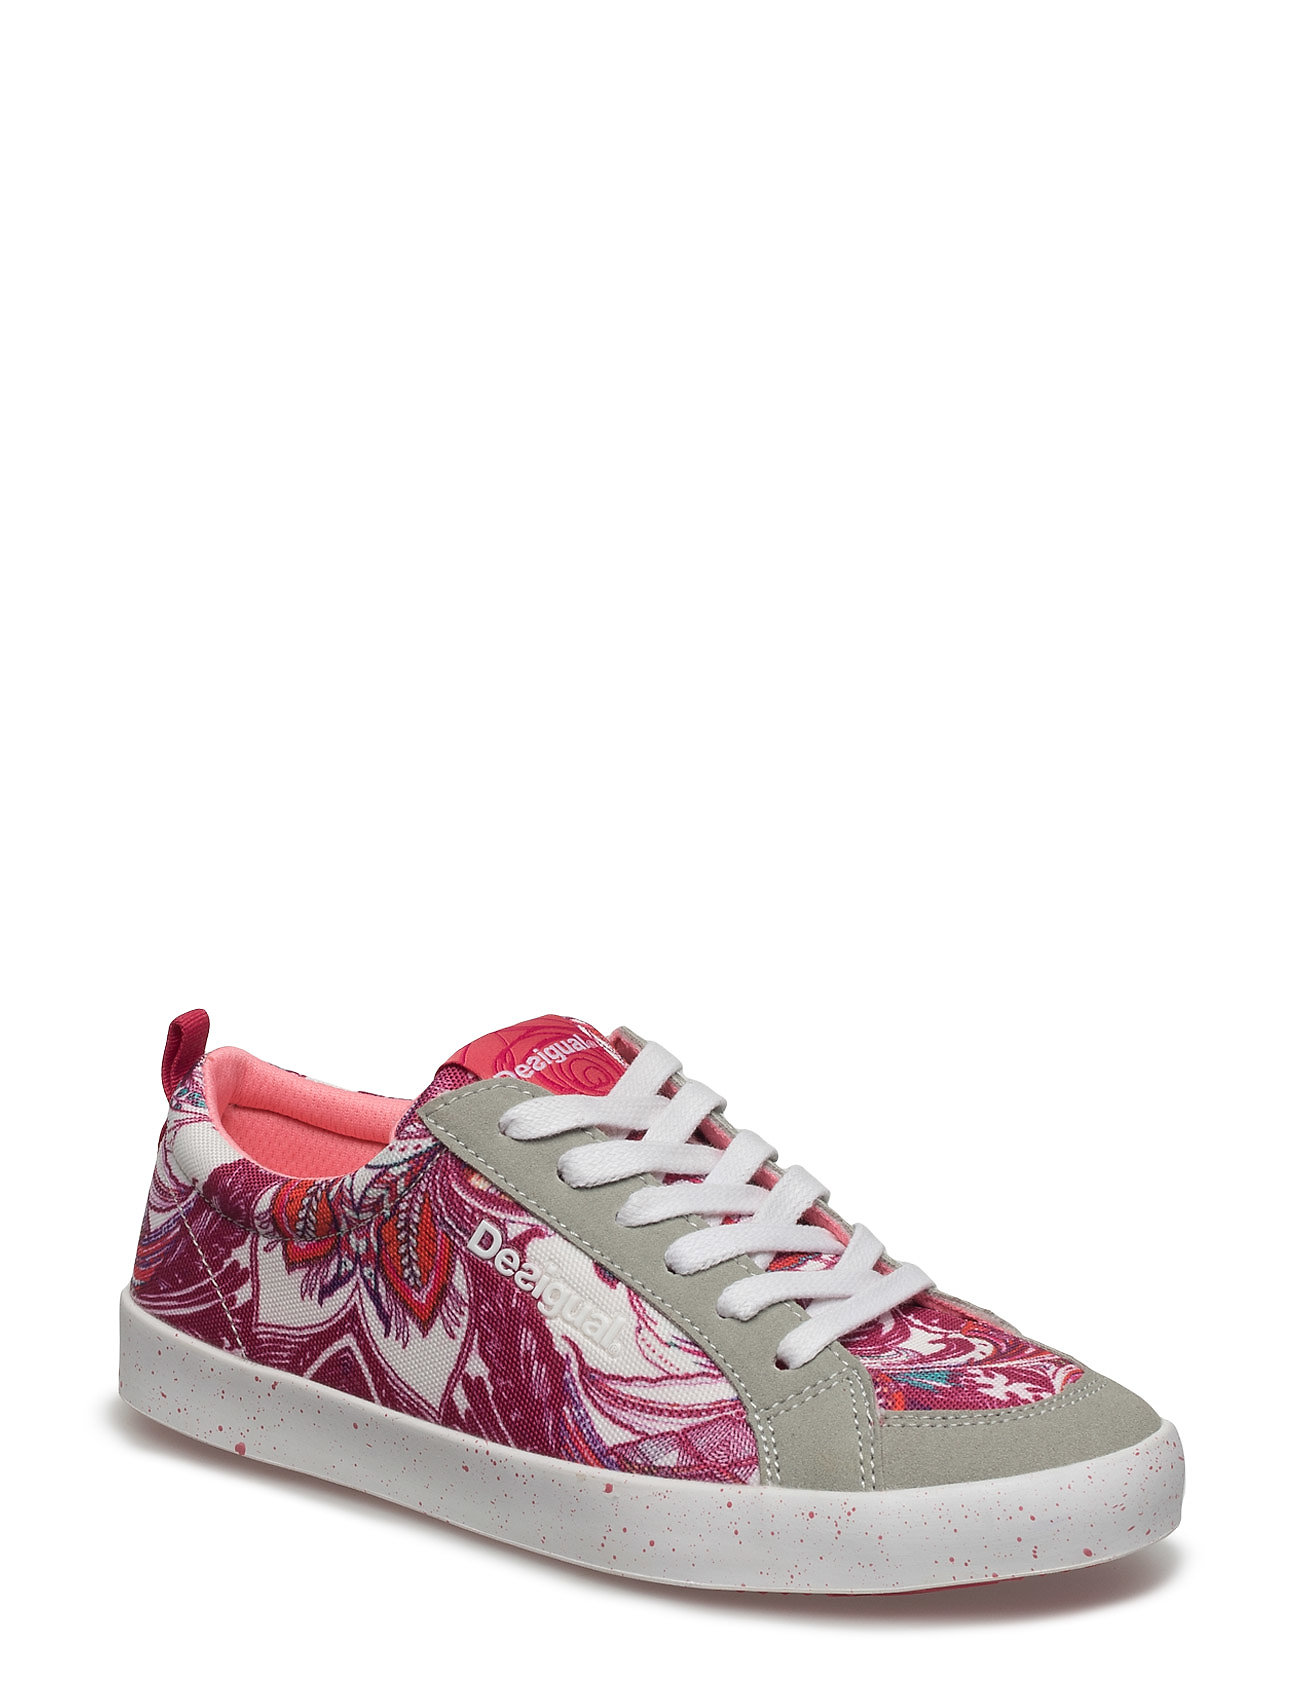 Shoes Classic P Desigual Sport Sneakers til Damer i Blanco